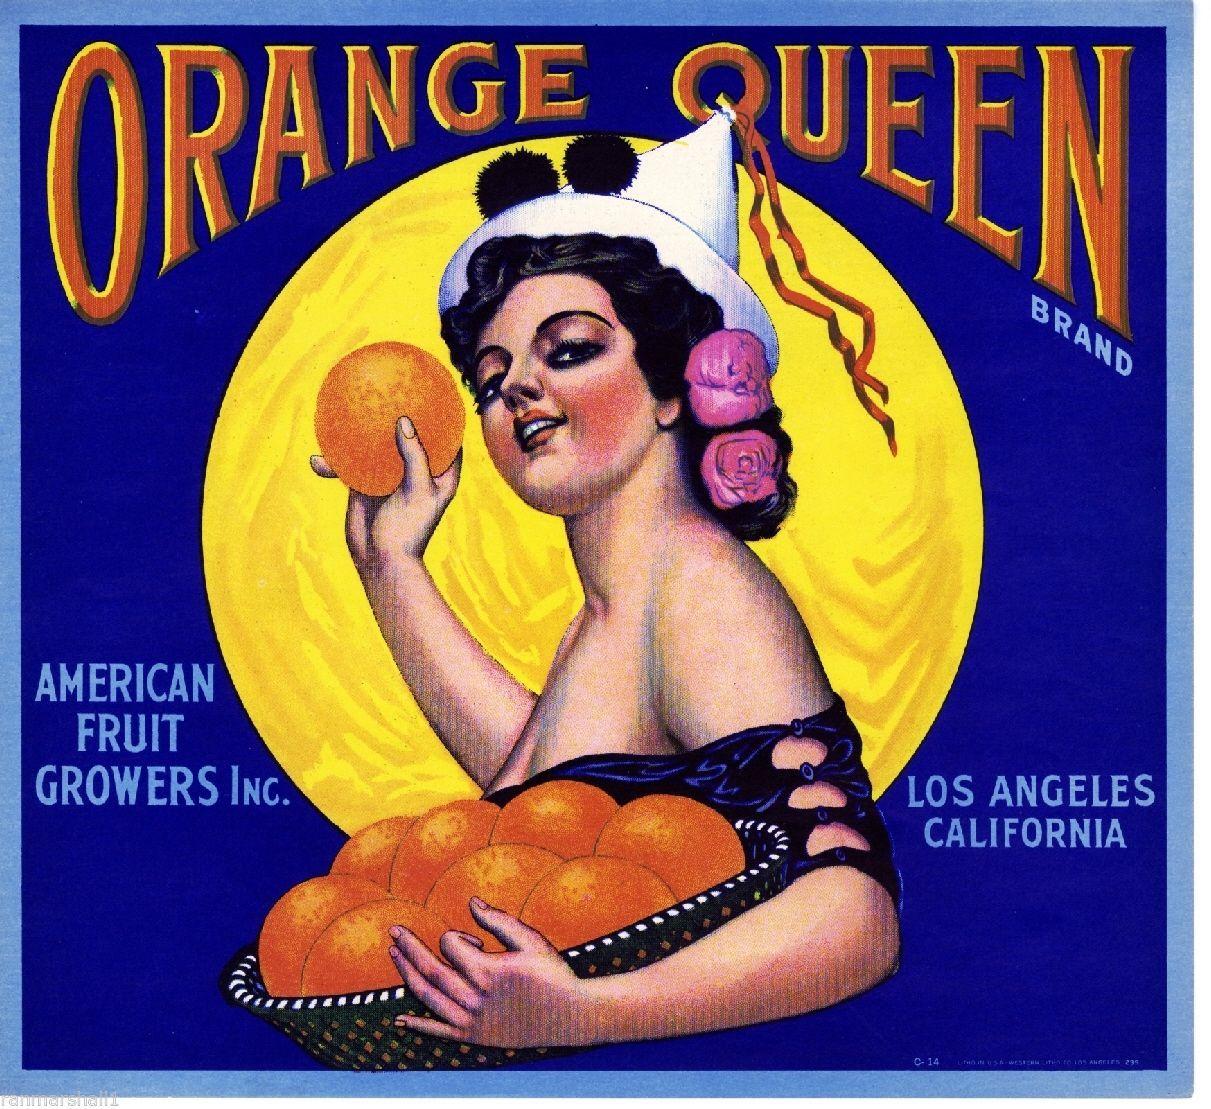 Los Angeles CA, Orange Queen fruit crate label